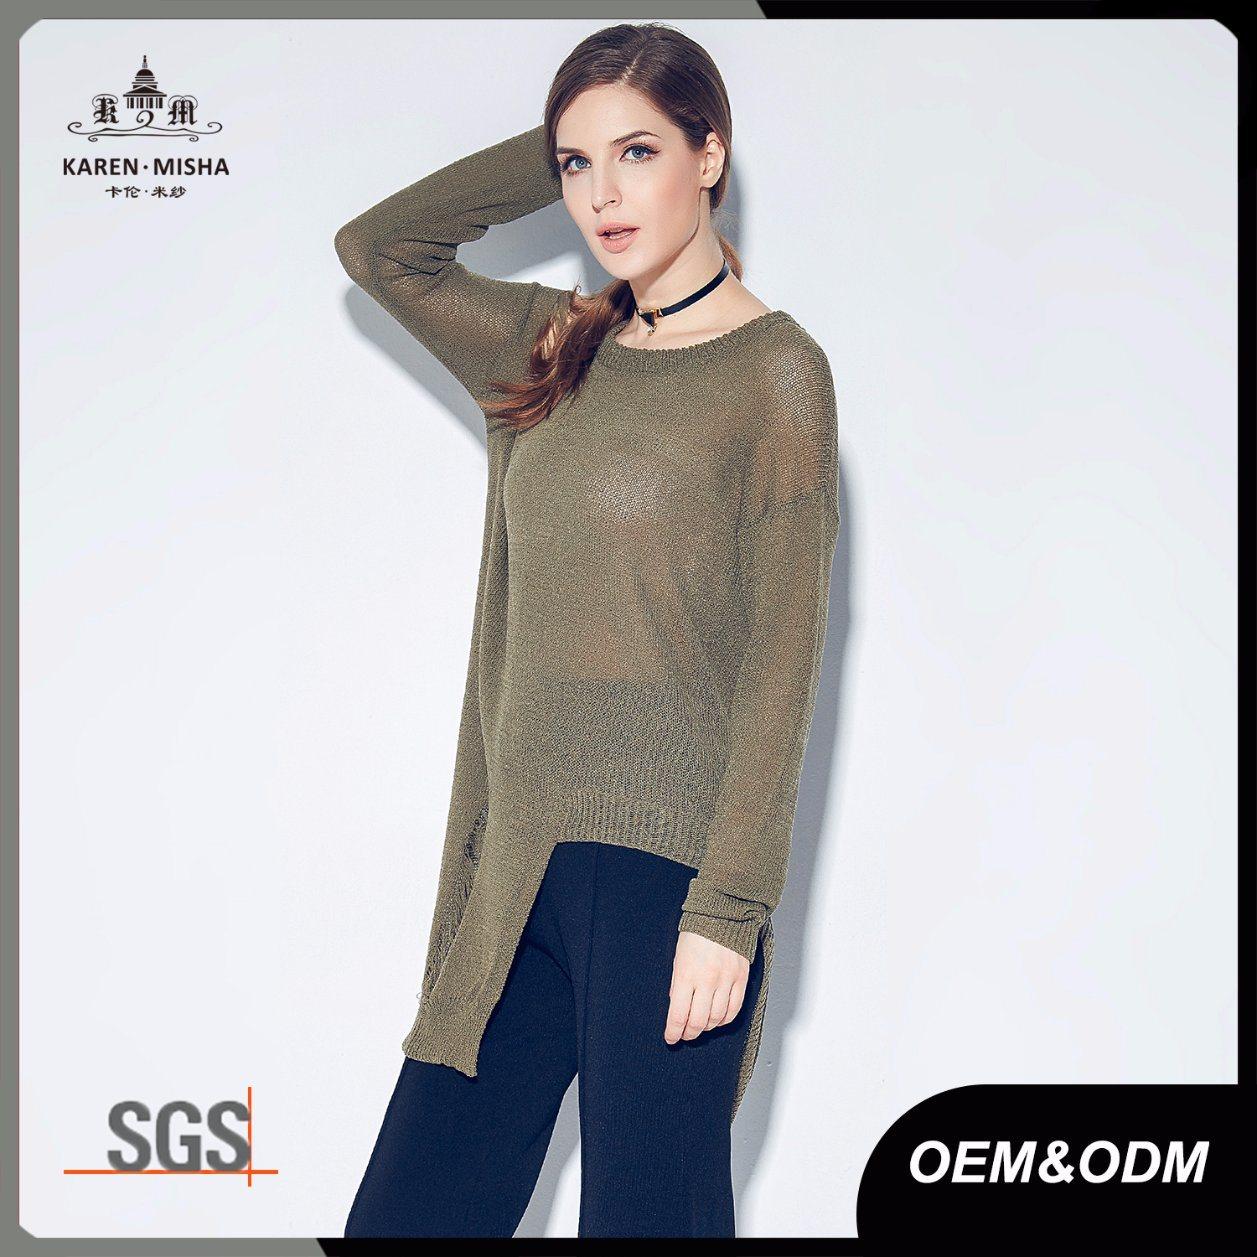 Longline Assymmetric Distressed Lader Womens Knitted Jumper